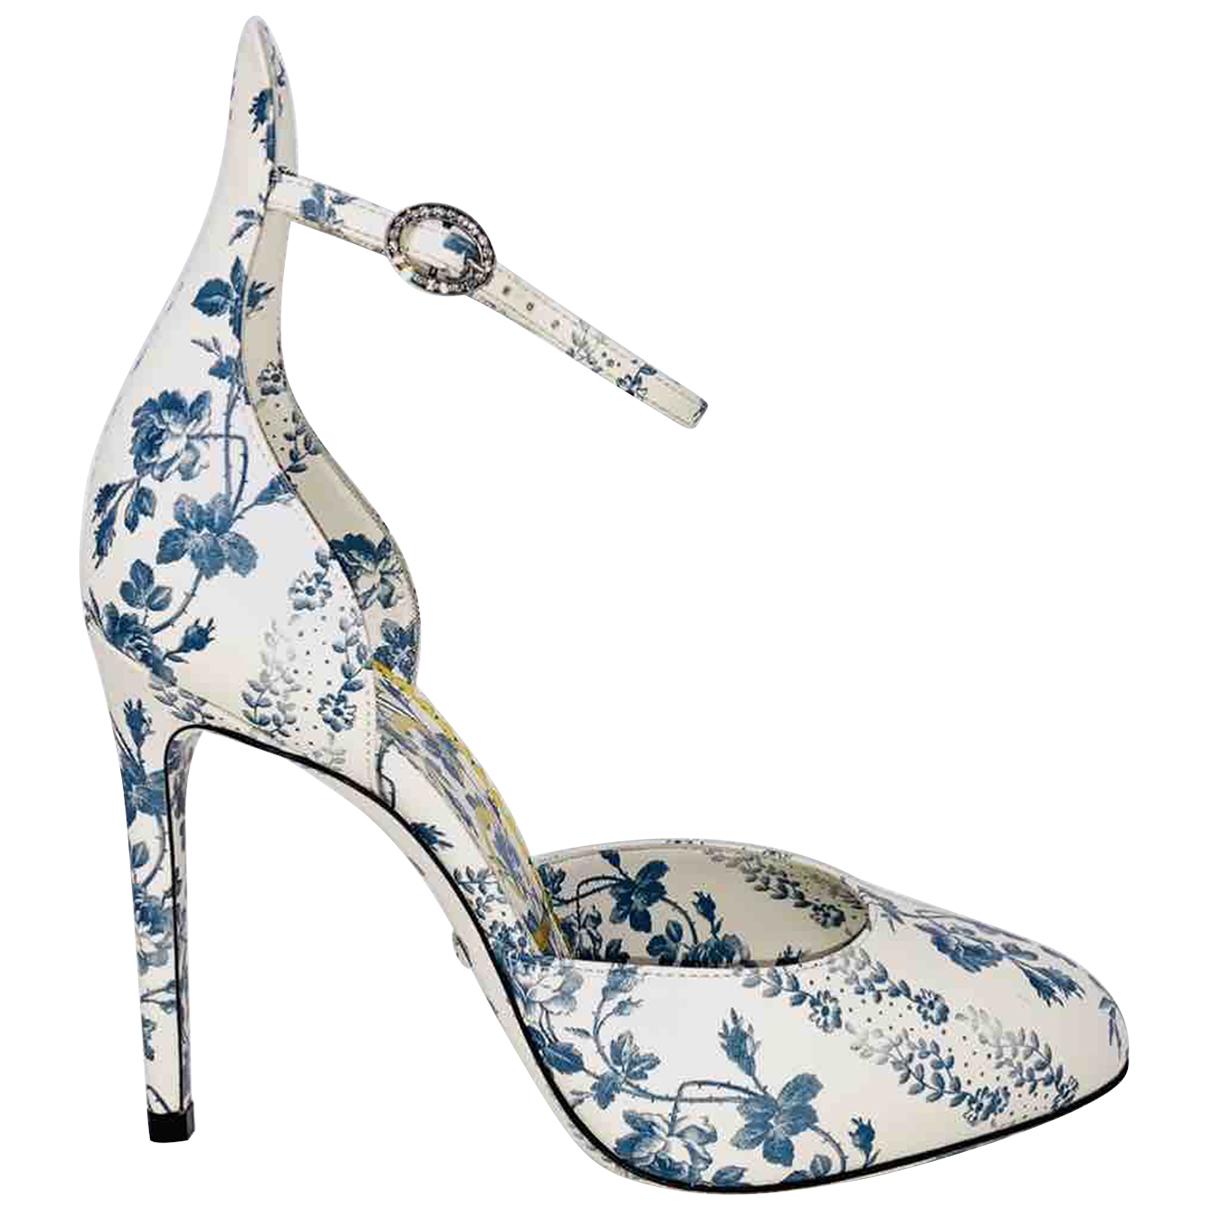 Gucci - Escarpins Malaga pour femme en cuir - blanc